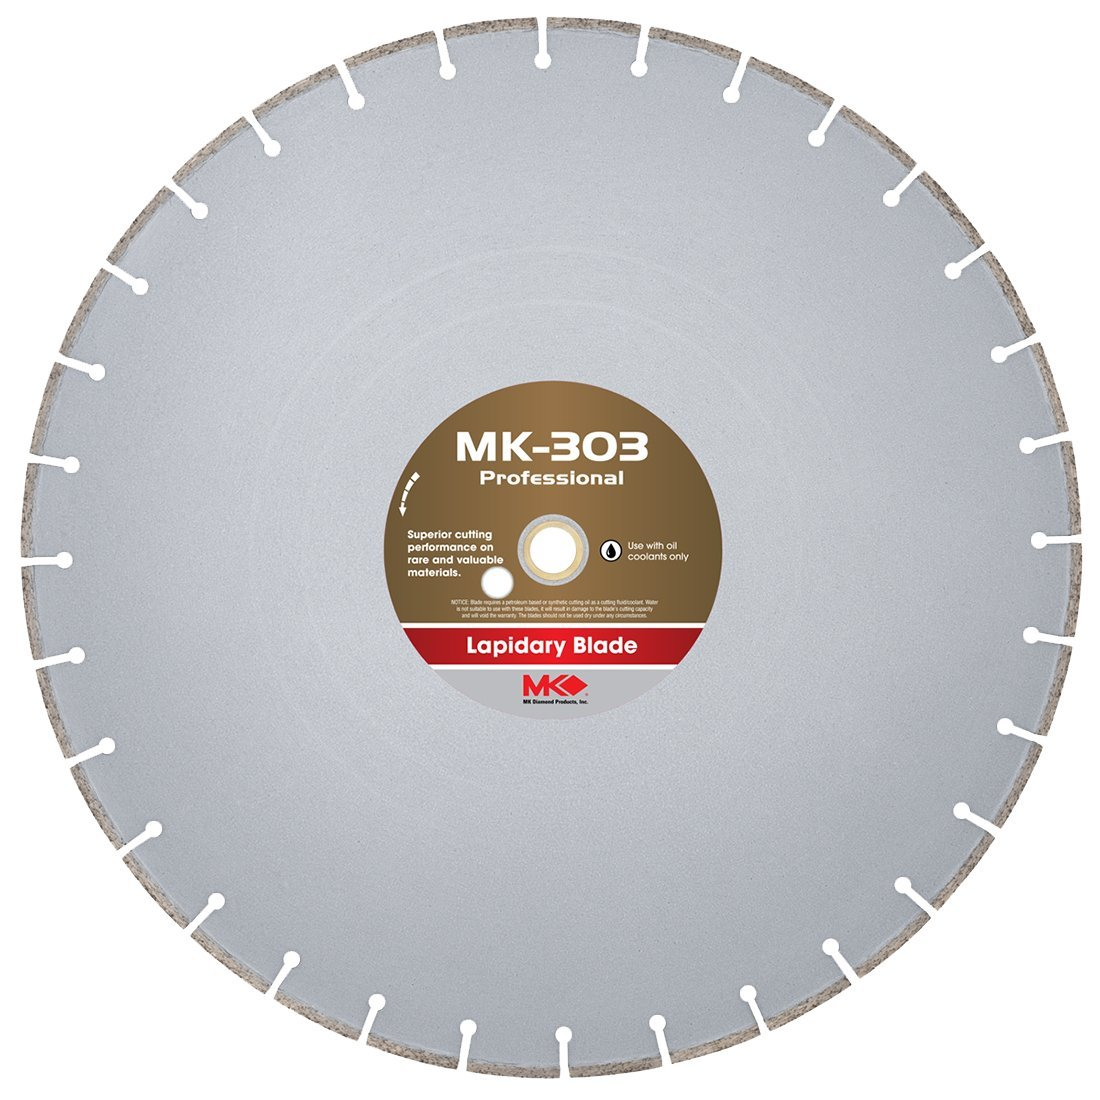 Disco de Diamante MK DIAMOND 156729 lapidario de corte húmedo MK303 18 pulg.